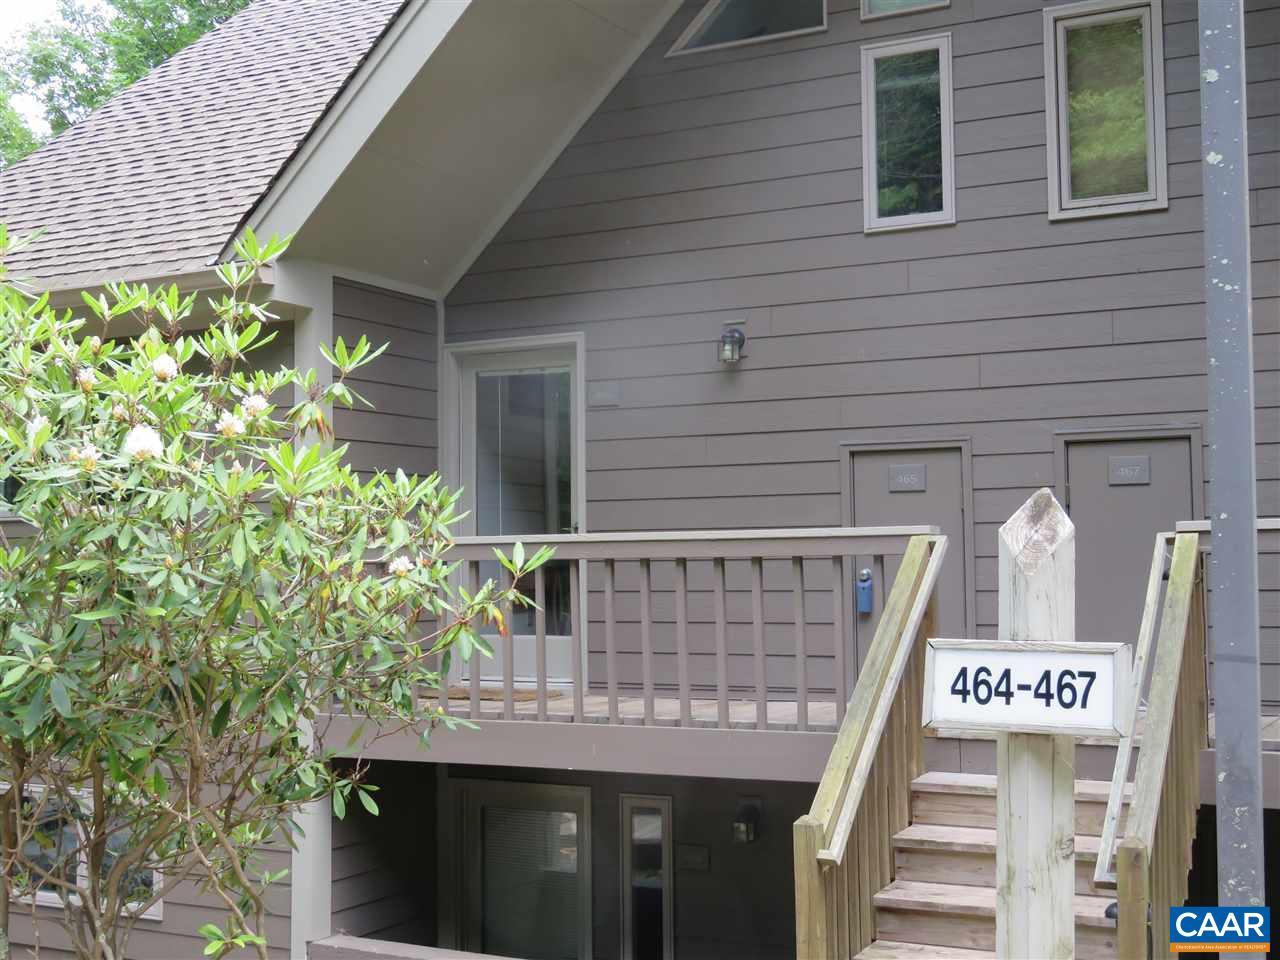 465 THREE RIDGES CONDOS, WINTERGREEN RESORT, VA 22967